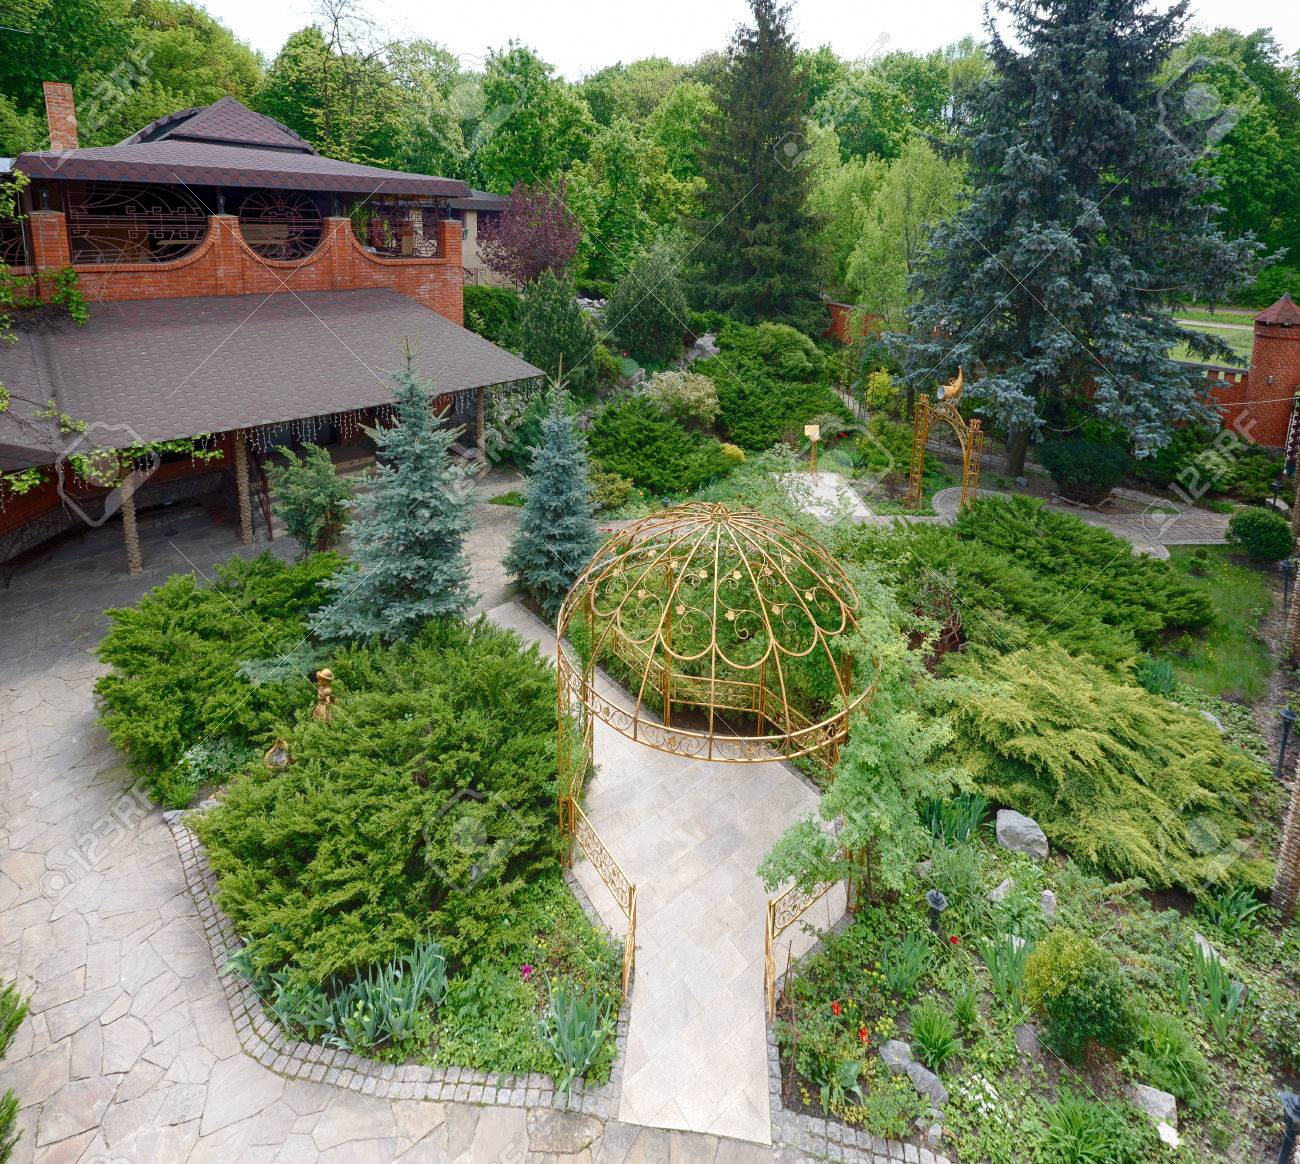 Beautiful Landscape Design, Garden Path With Stone Tiles, Evergreen Bushes,  Fir Trees,